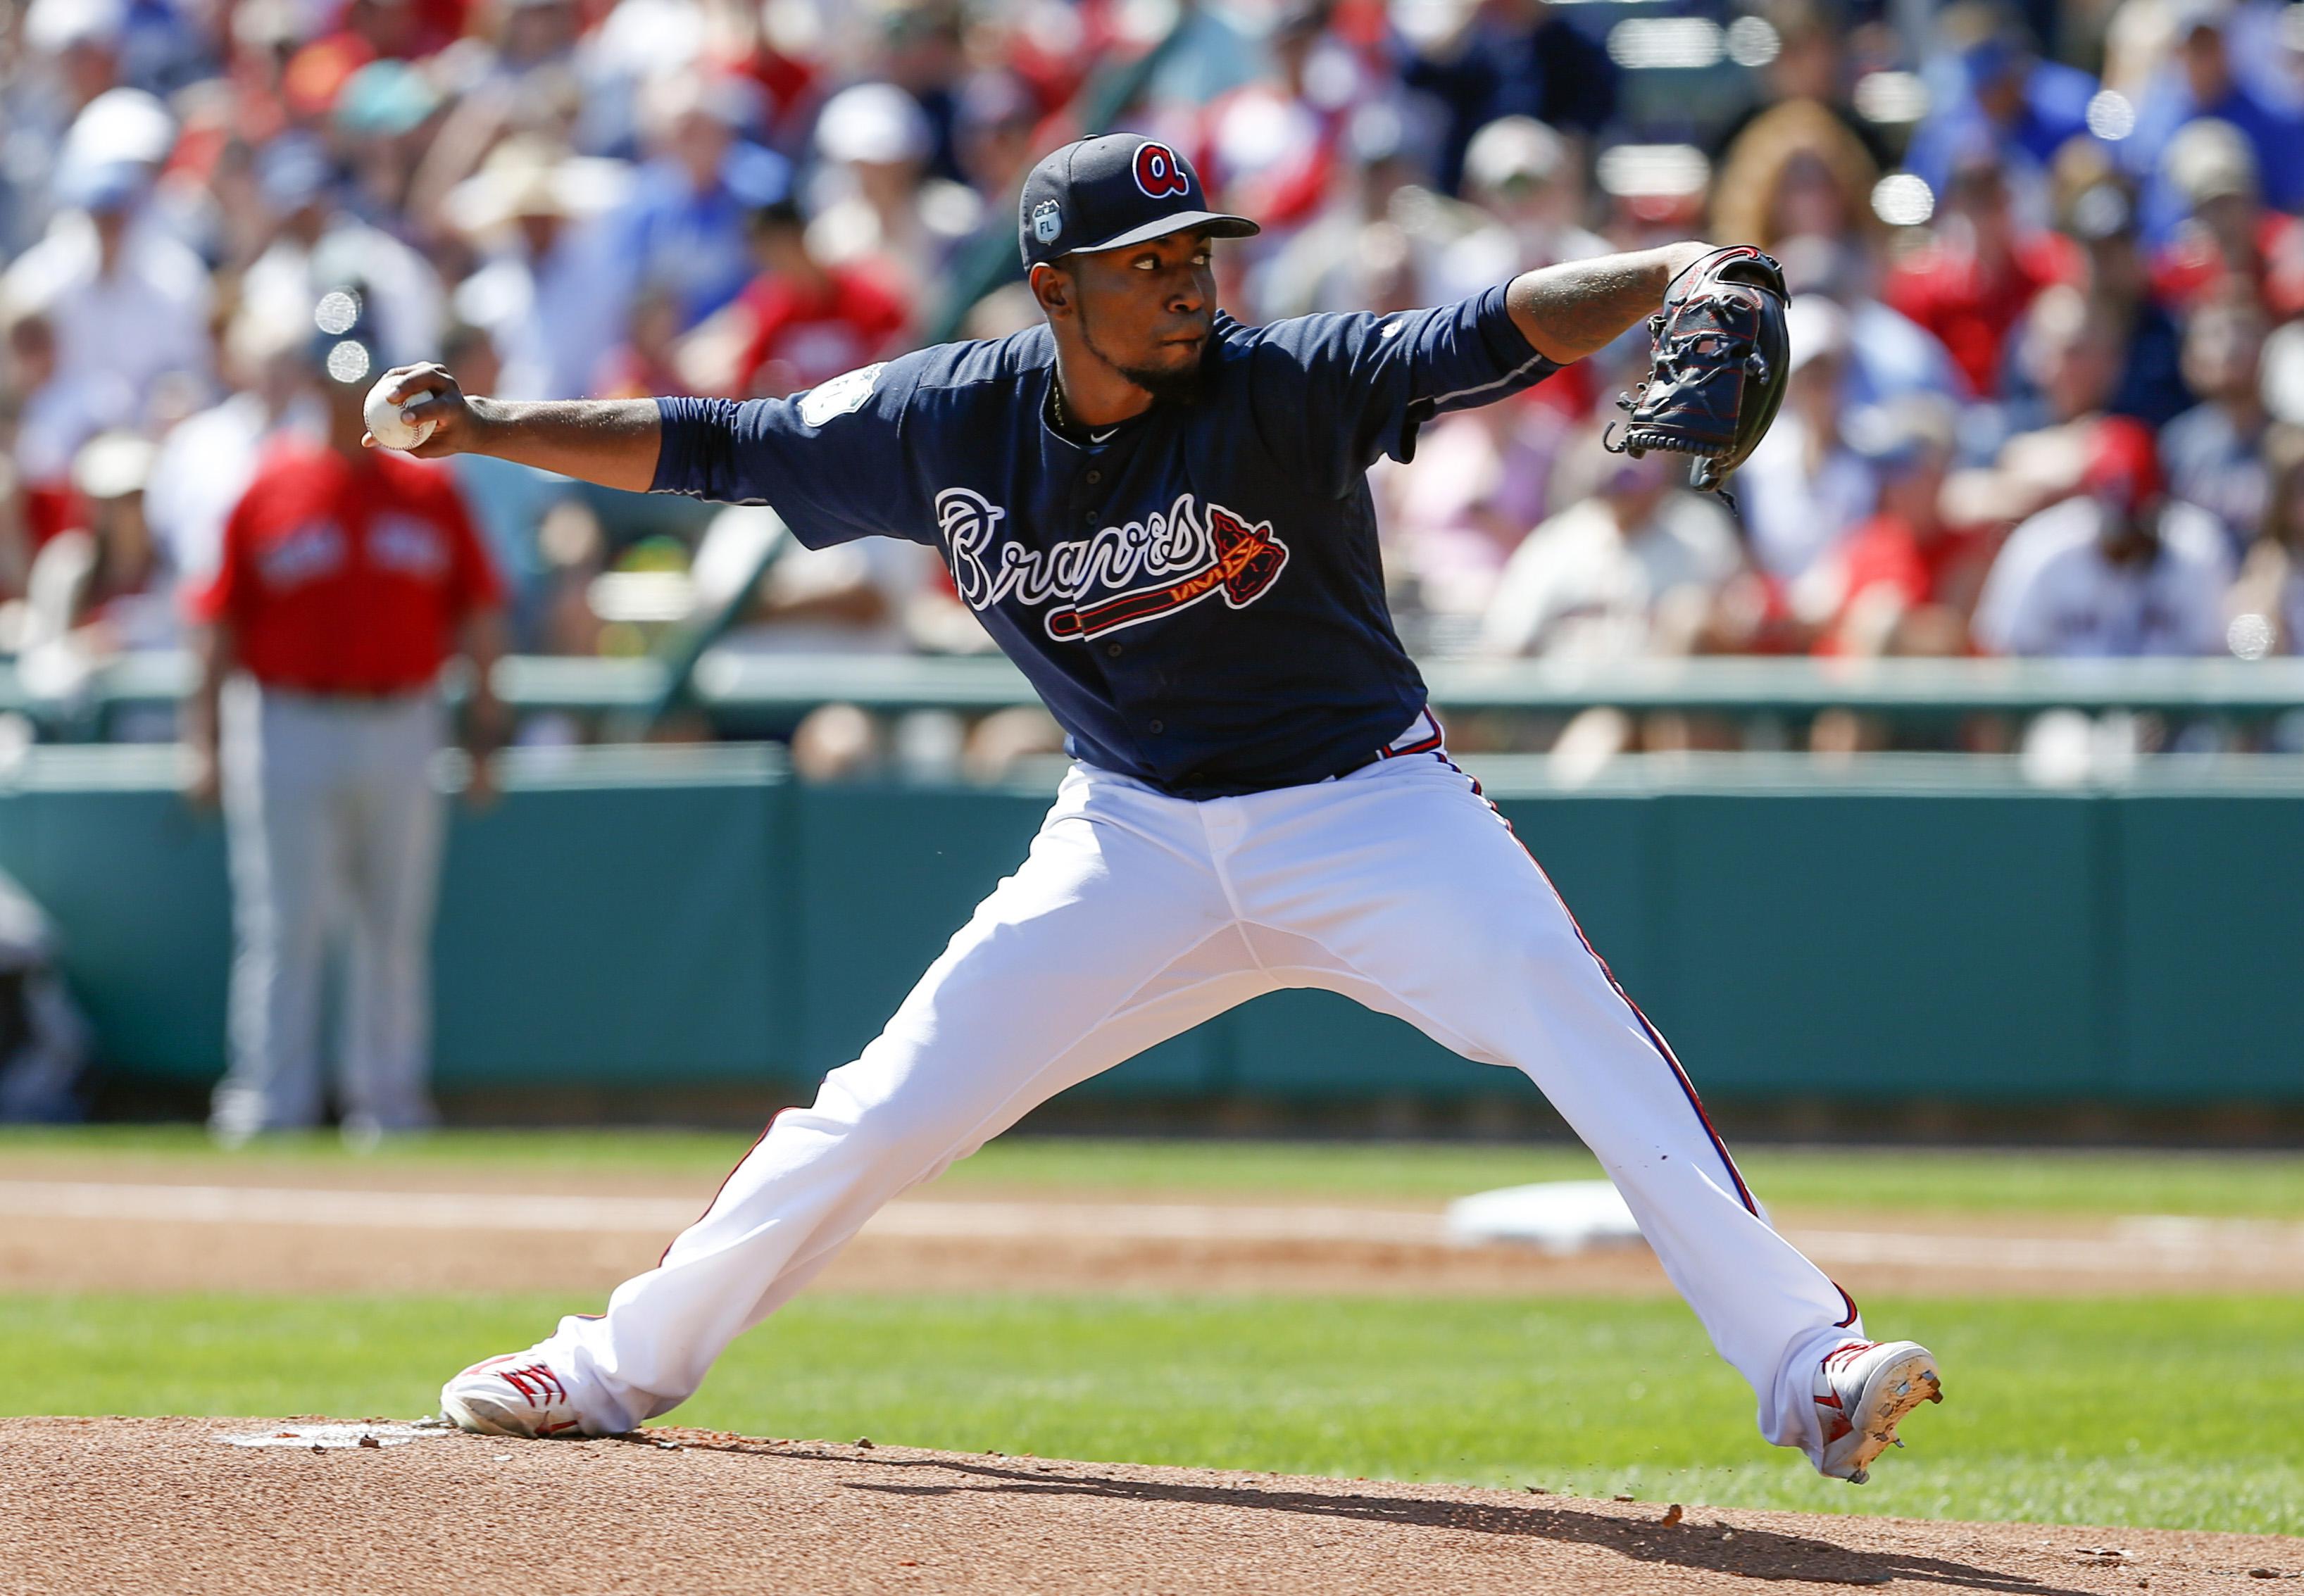 Atlanta Braves: Tough Stretch of Games AheadAtlanta Braves